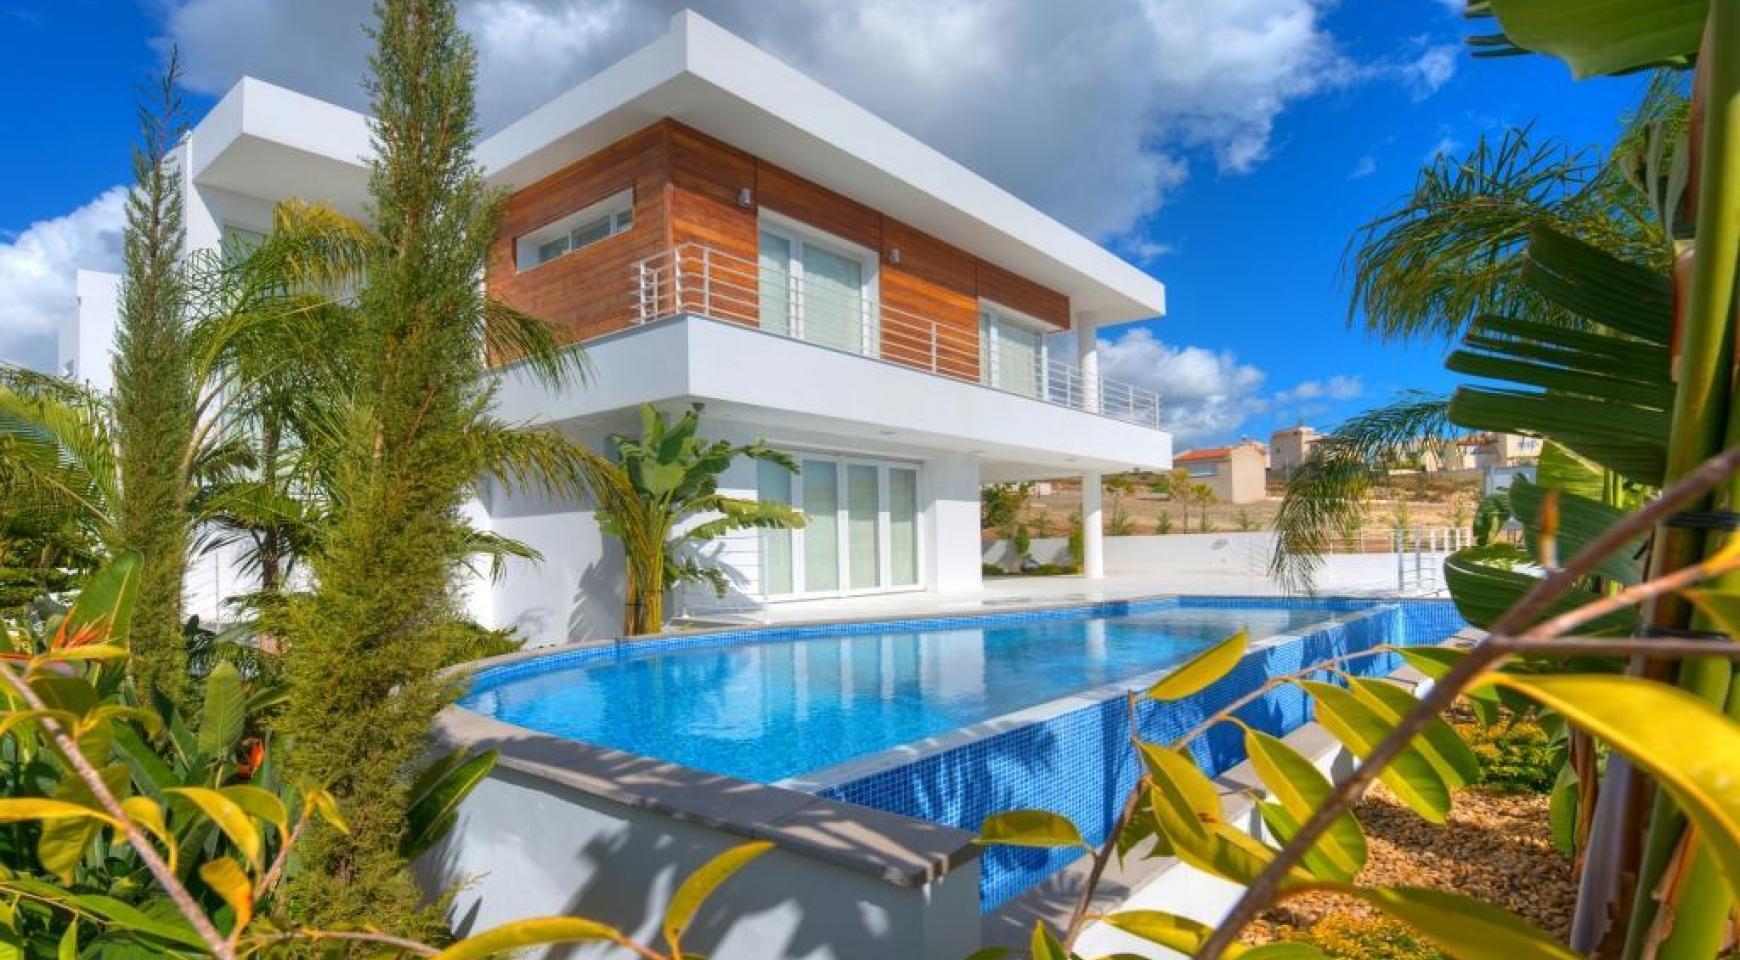 4-Спальная Вилла с Видом на Море в Районе Agios Tychonas - 1